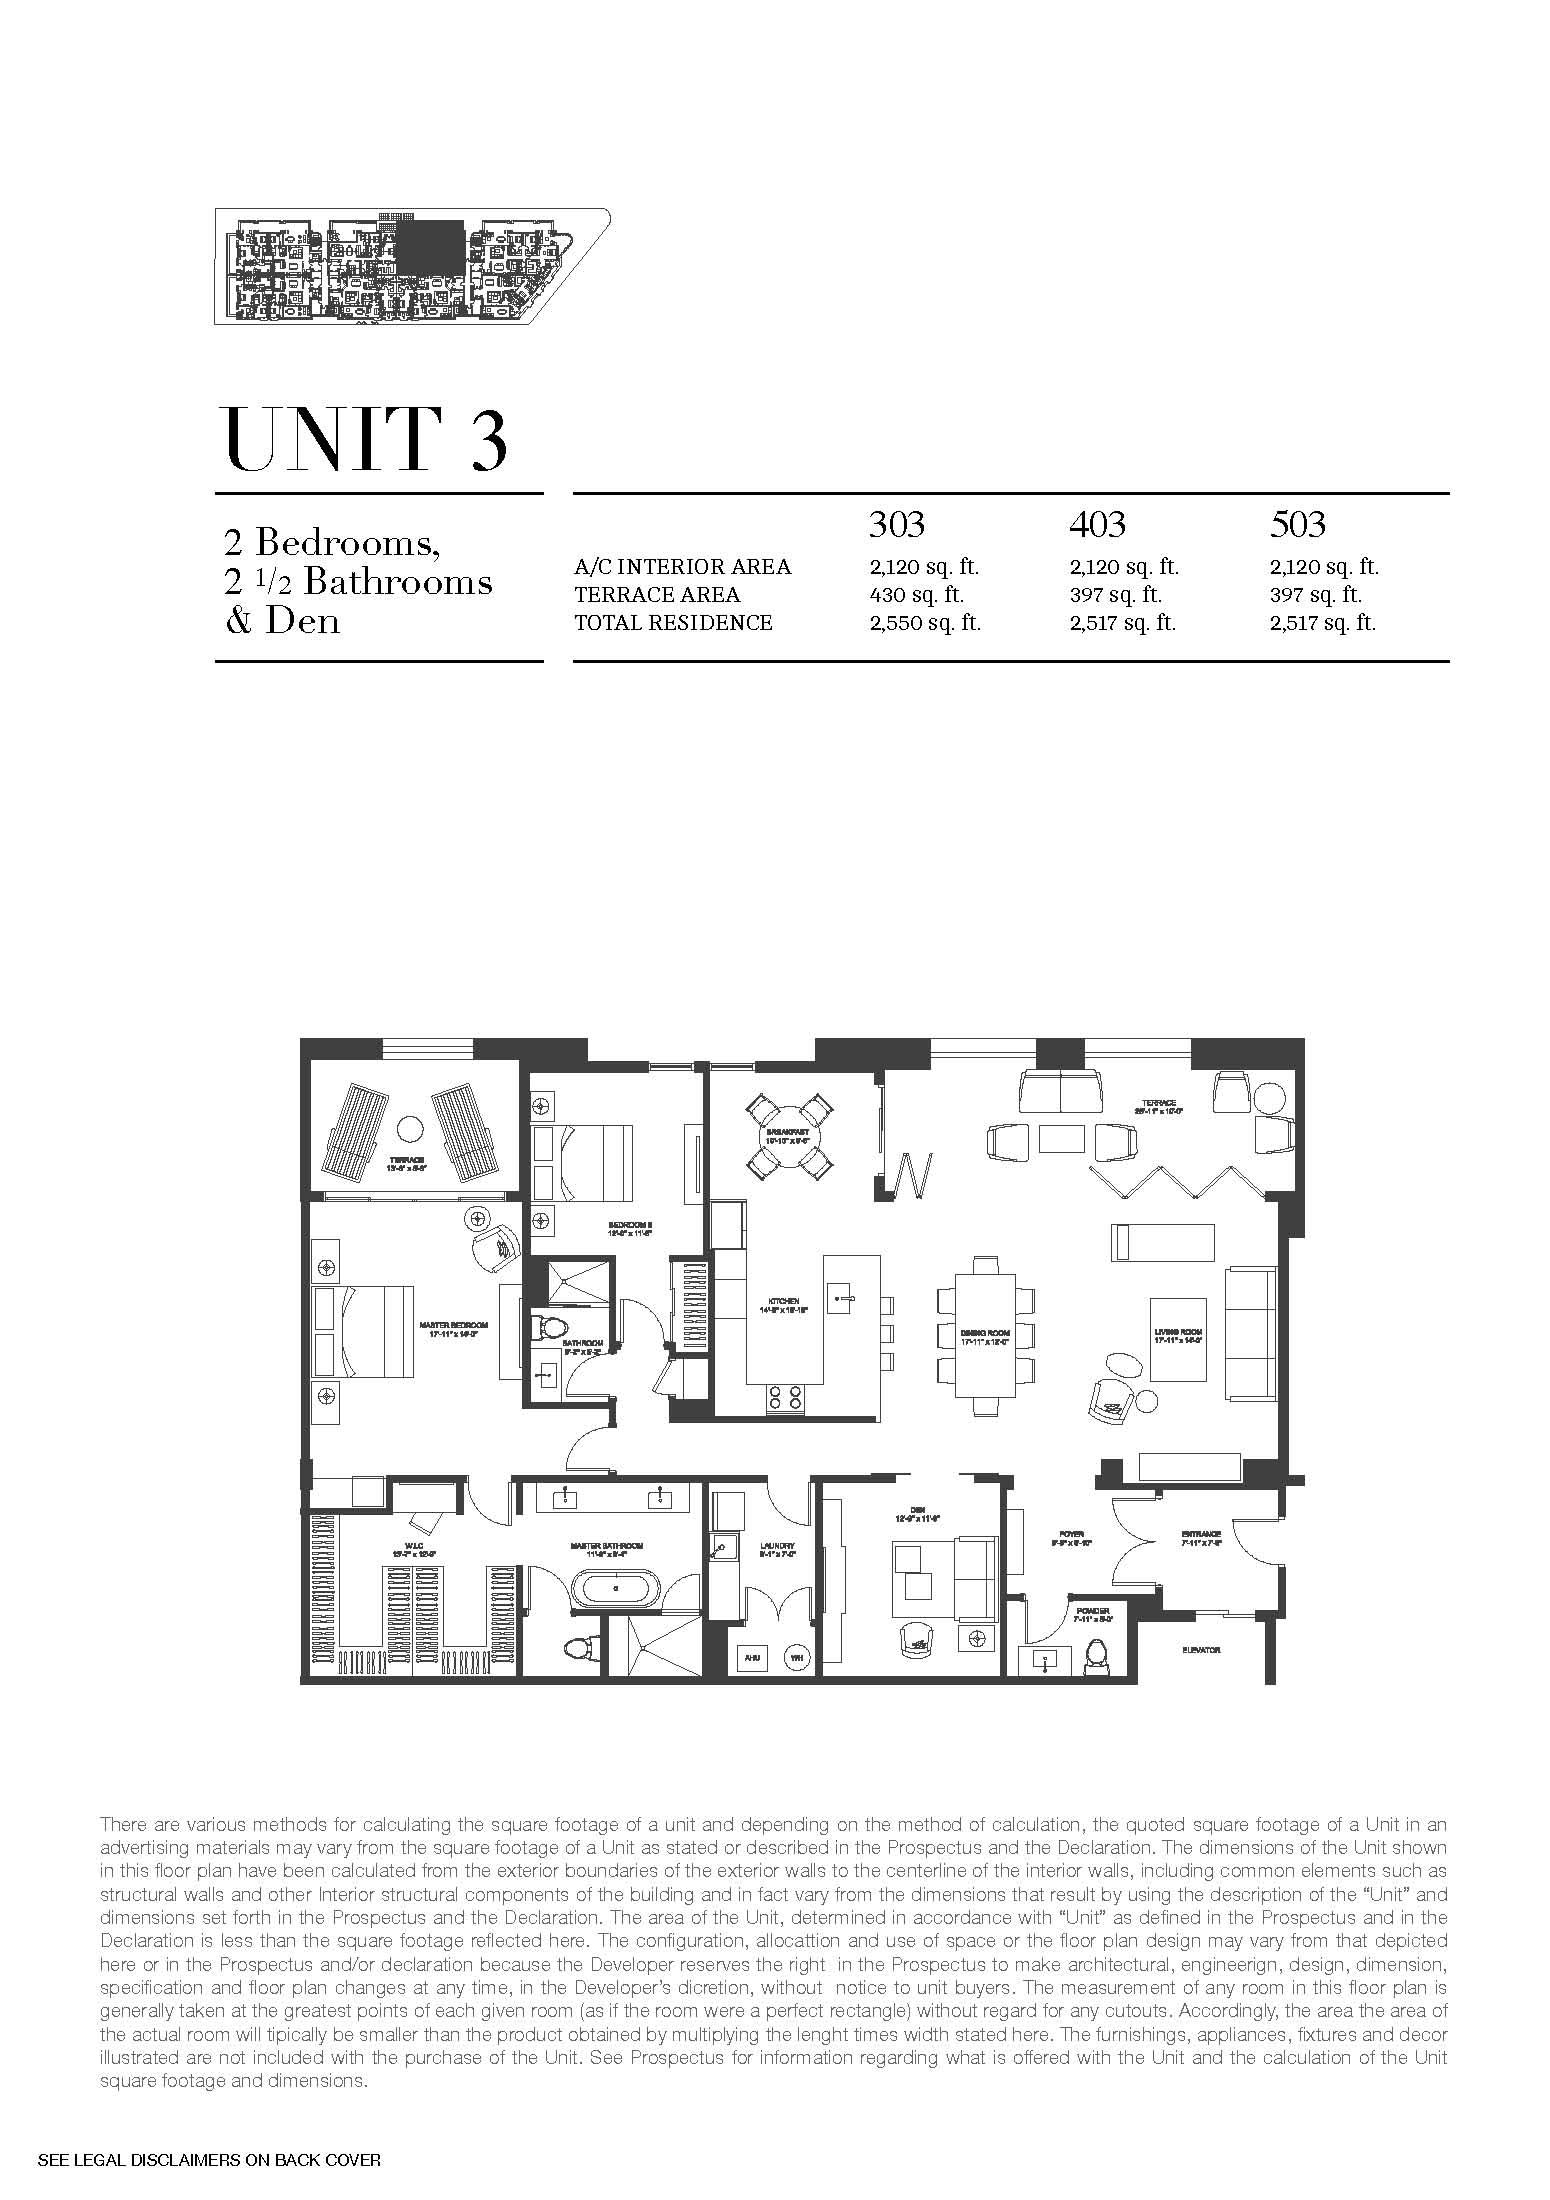 Biltmore Parc - Floorplan 3